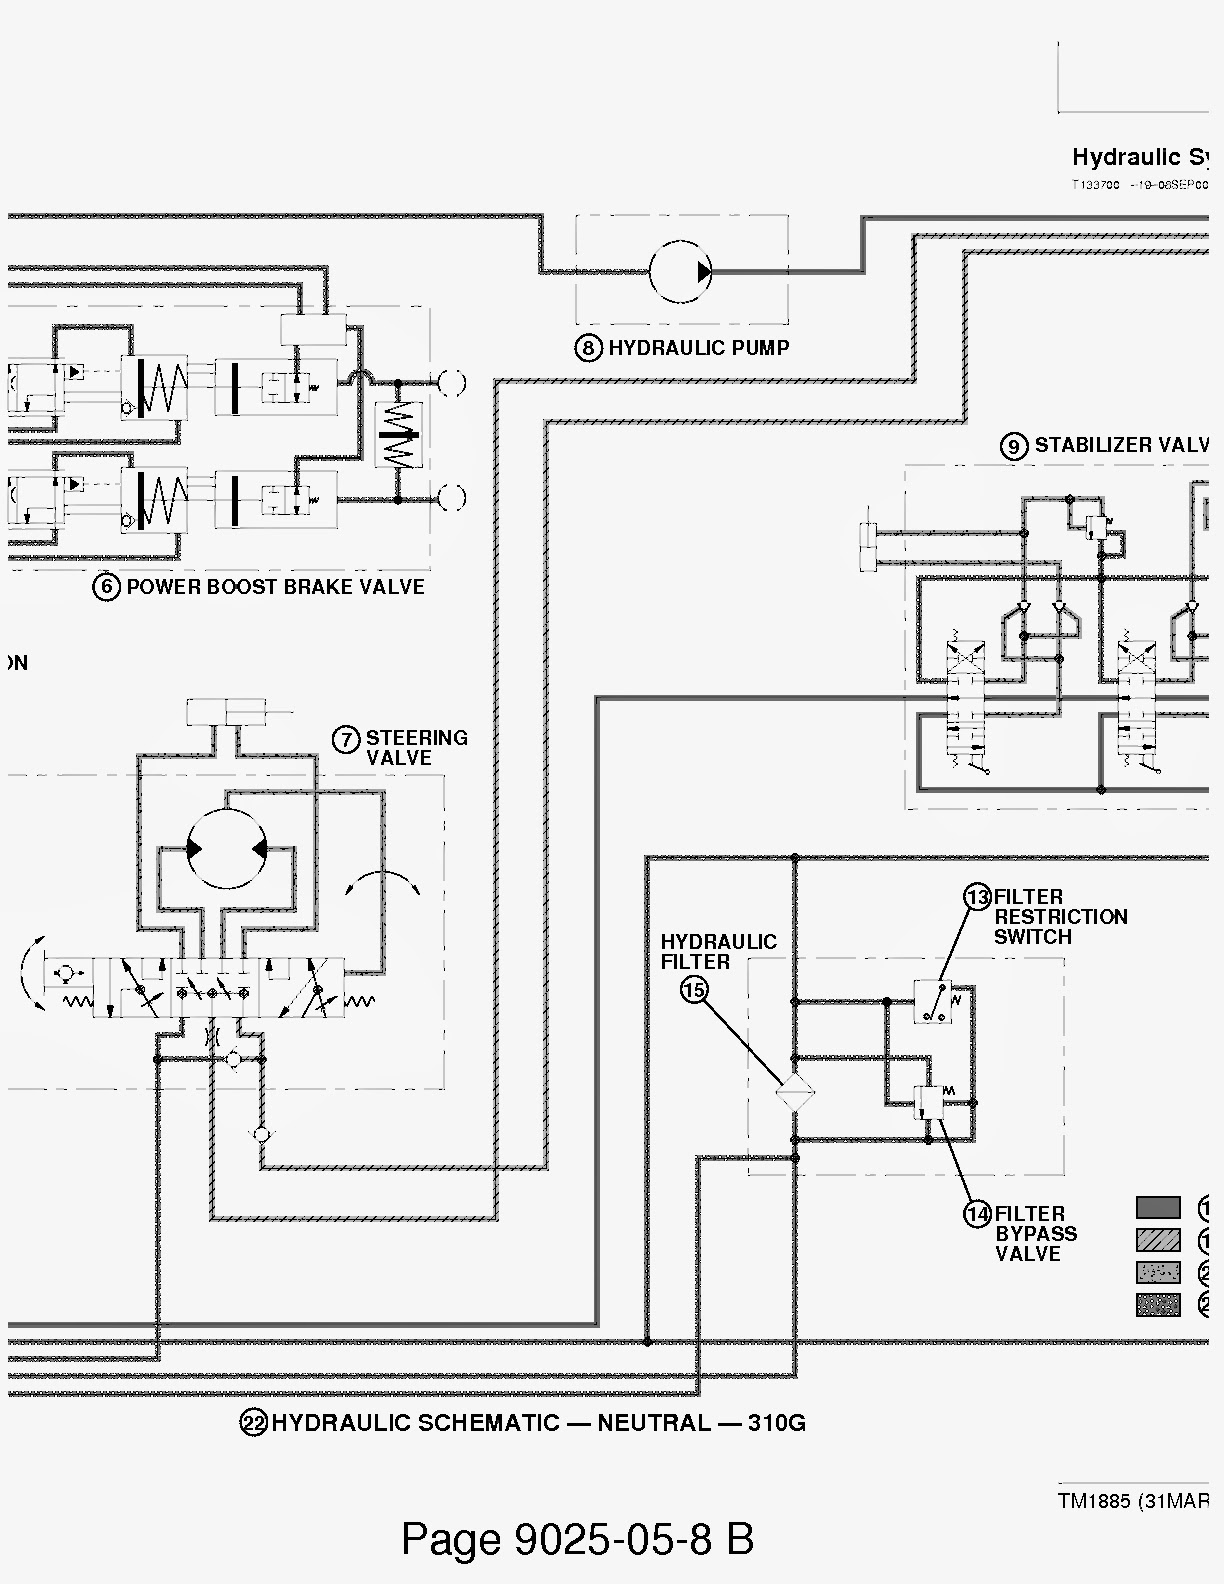 medium resolution of wrg 9829 310g john deere wiring diagram310g john deere wiring diagram